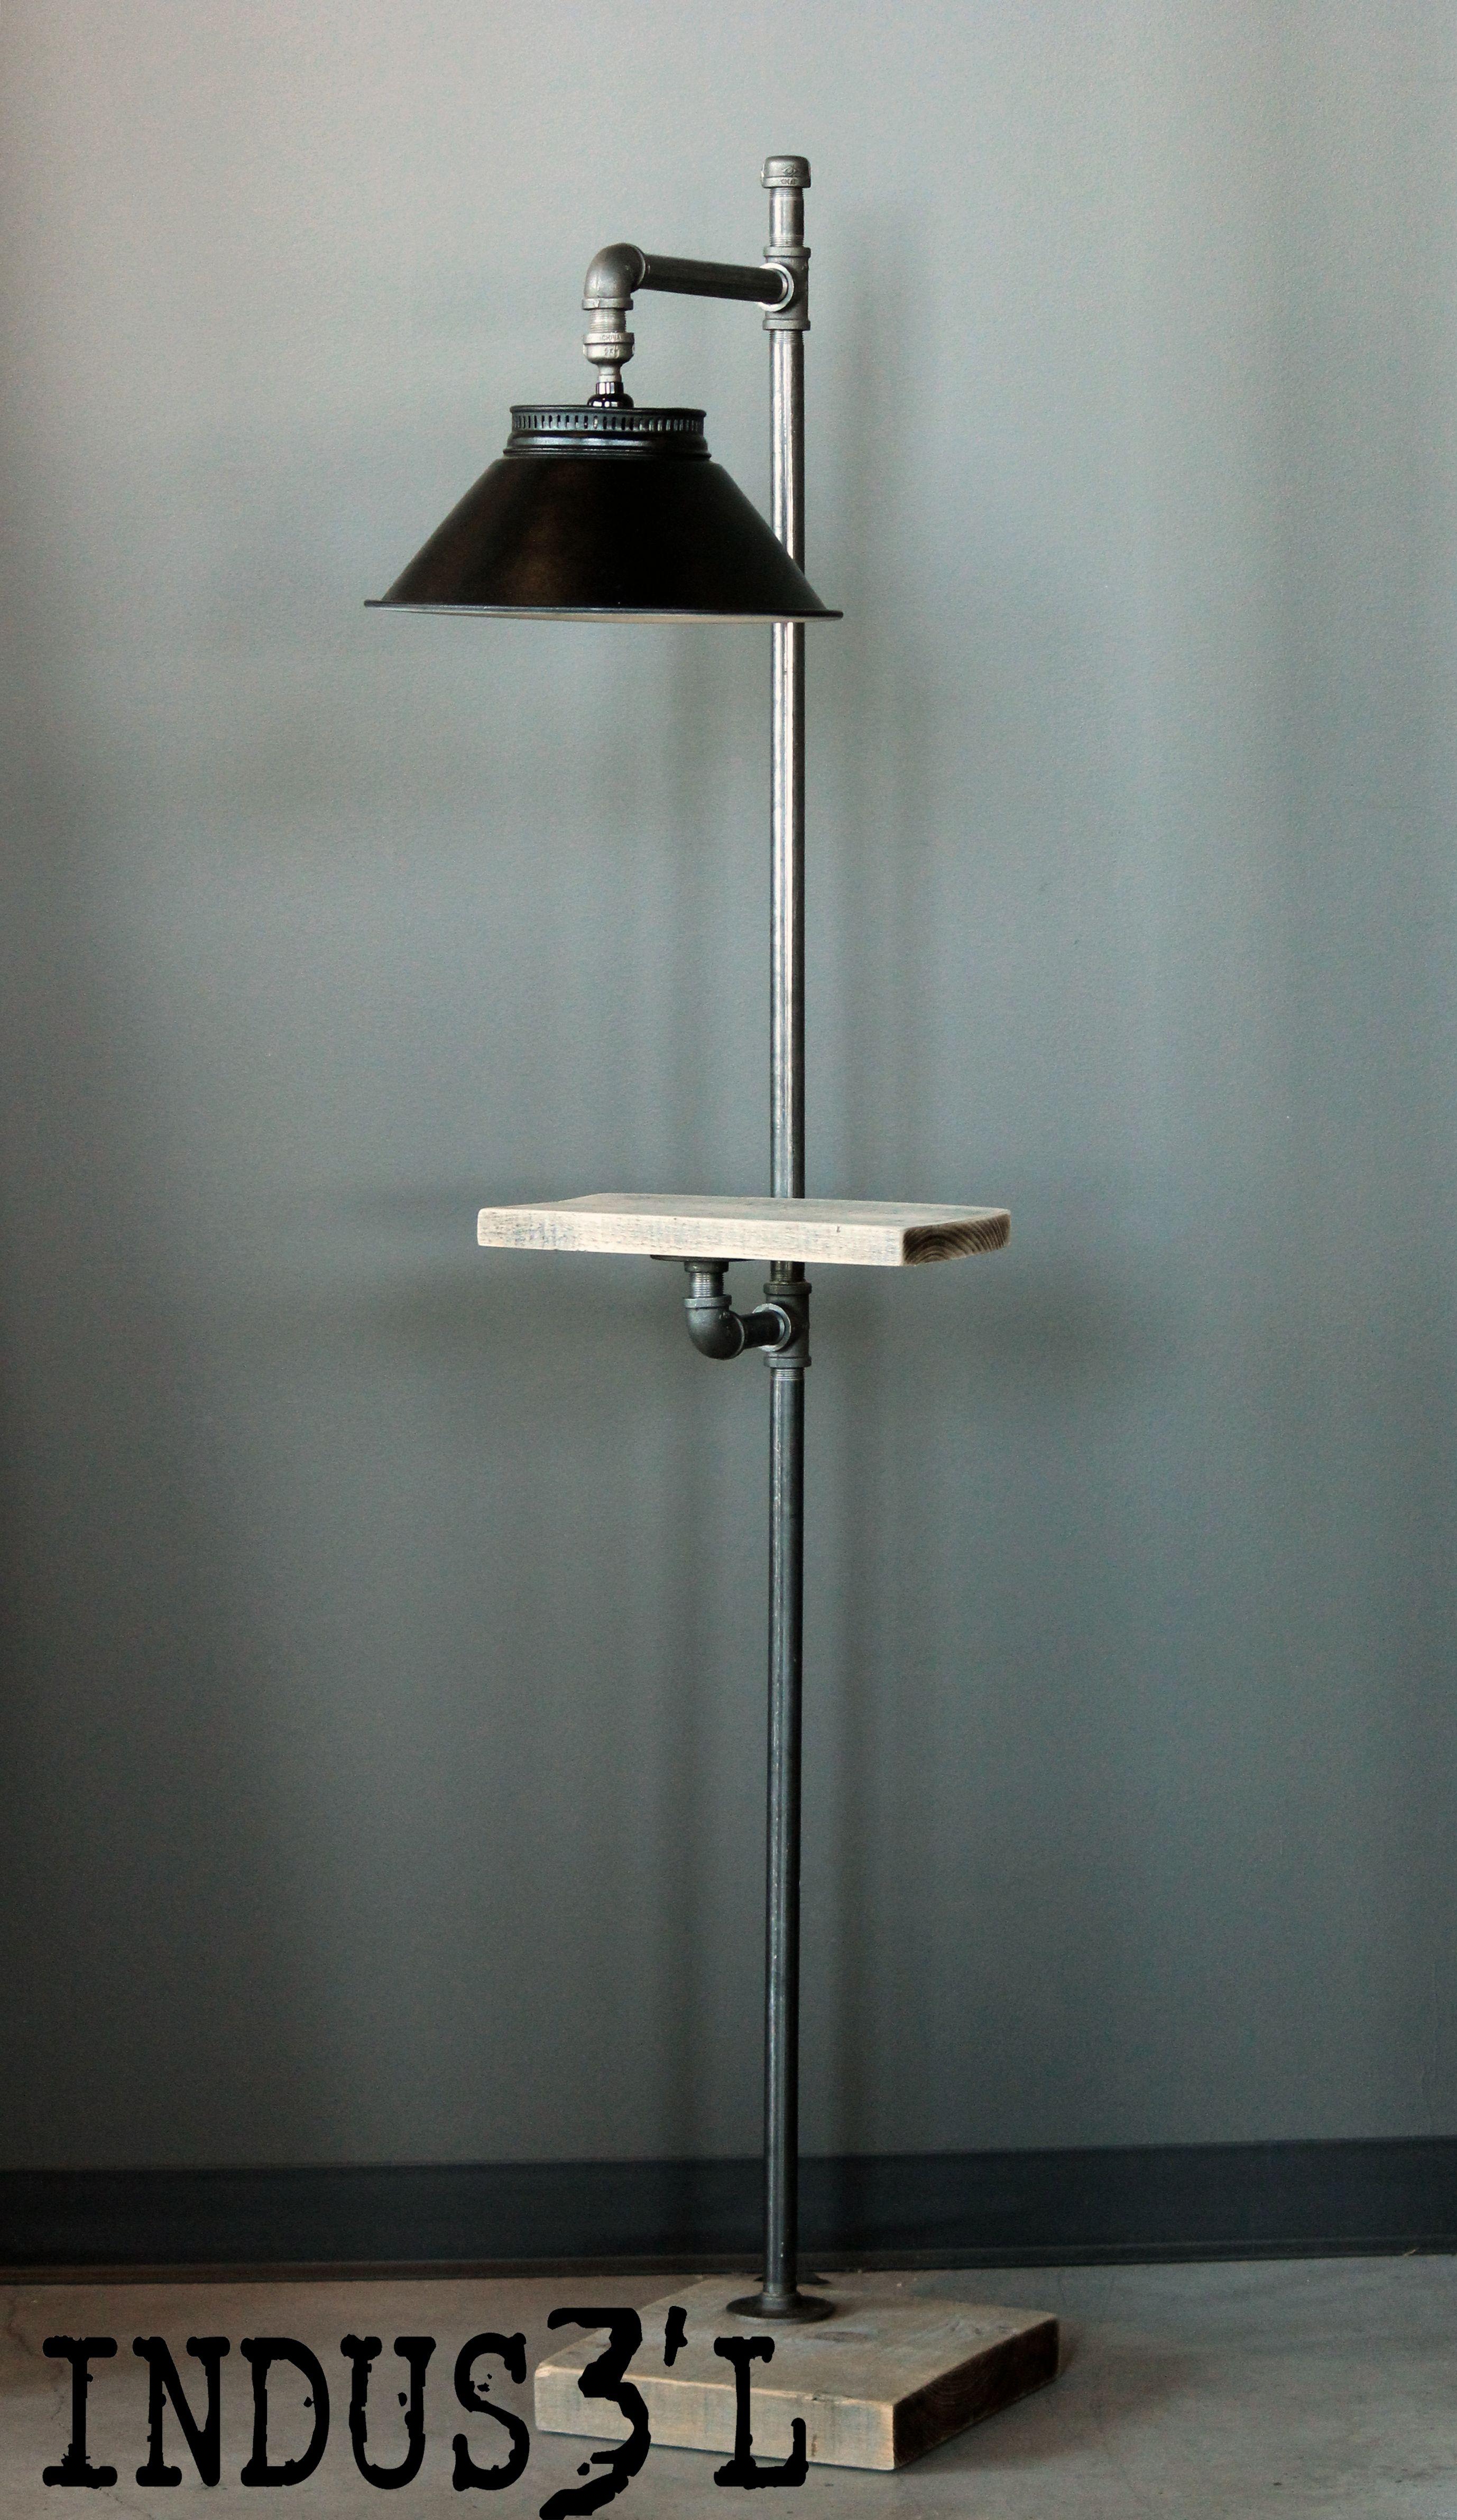 pingl par la shop de design sur industrial lighting and. Black Bedroom Furniture Sets. Home Design Ideas